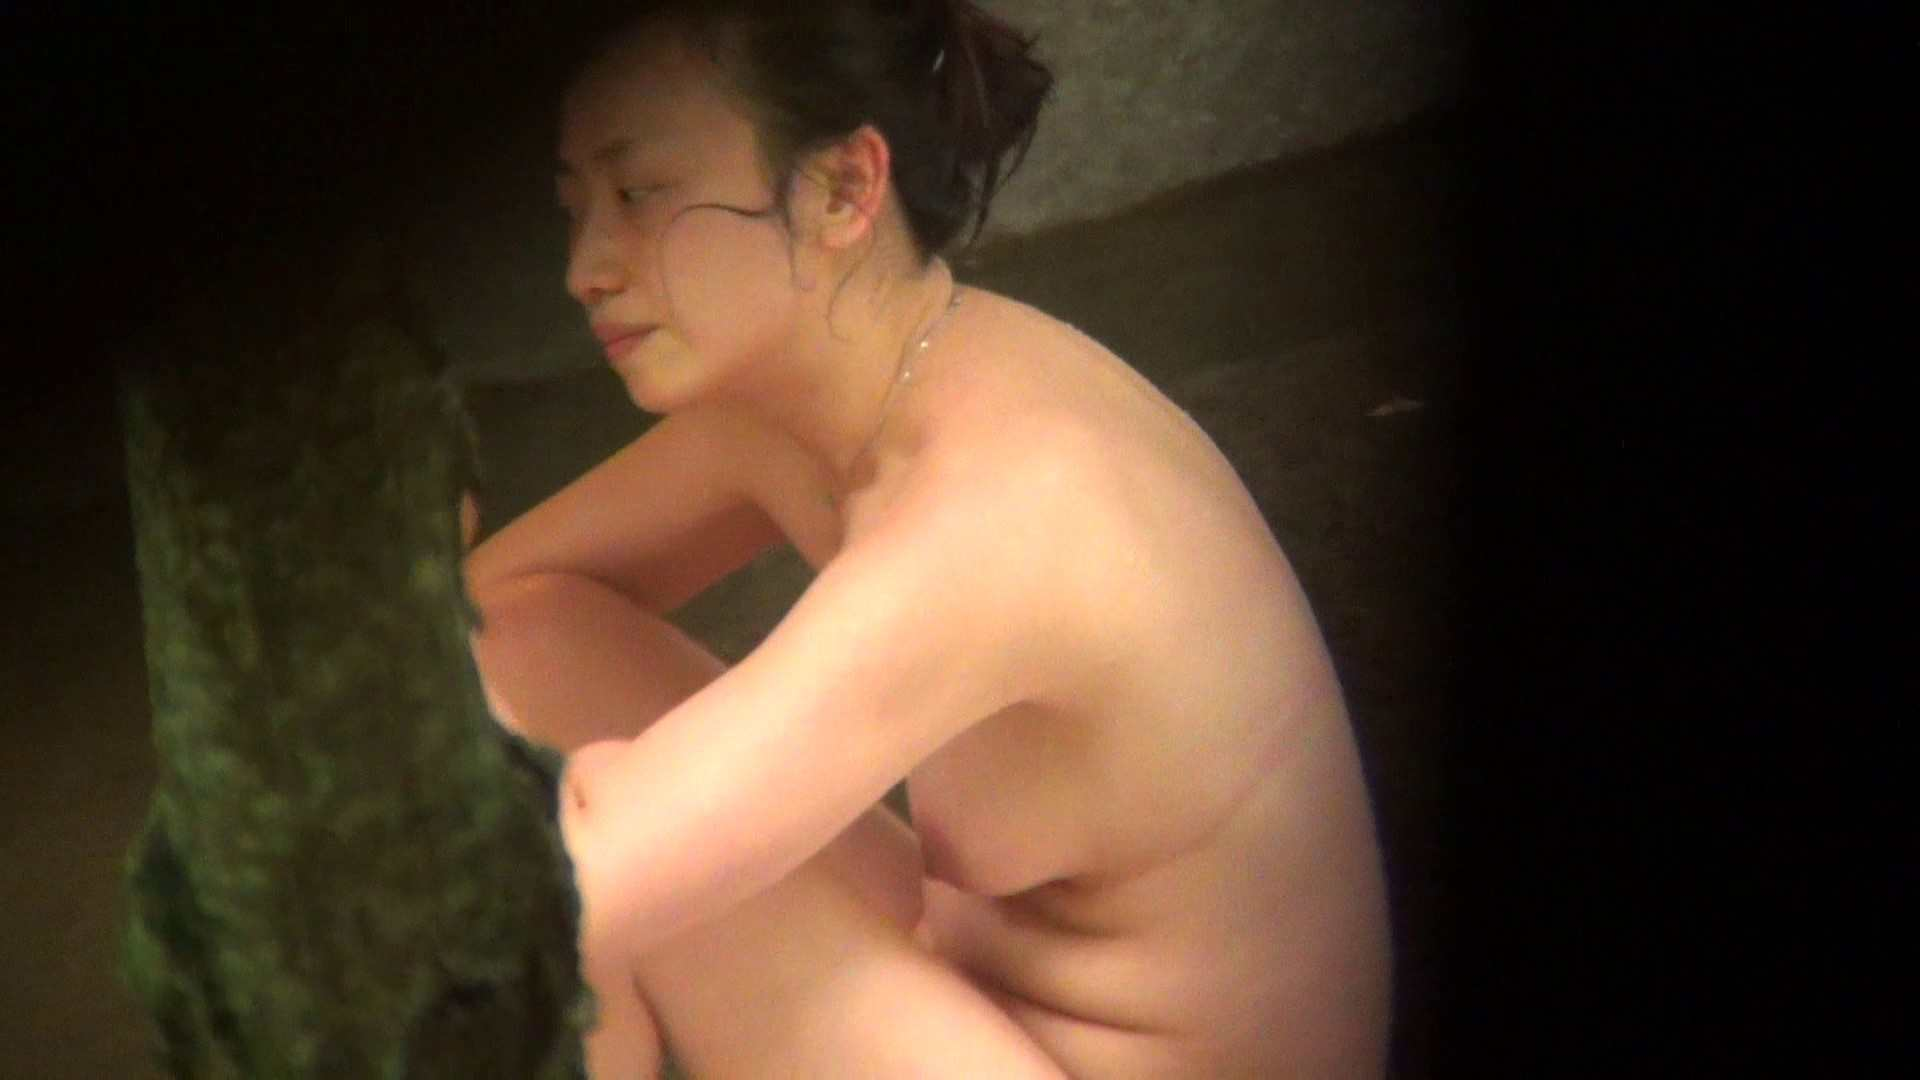 Vol.80 出産経験済みの弛んだ肉体と大胆すぎるアングル 美女達のヌード | OL  30連発 27